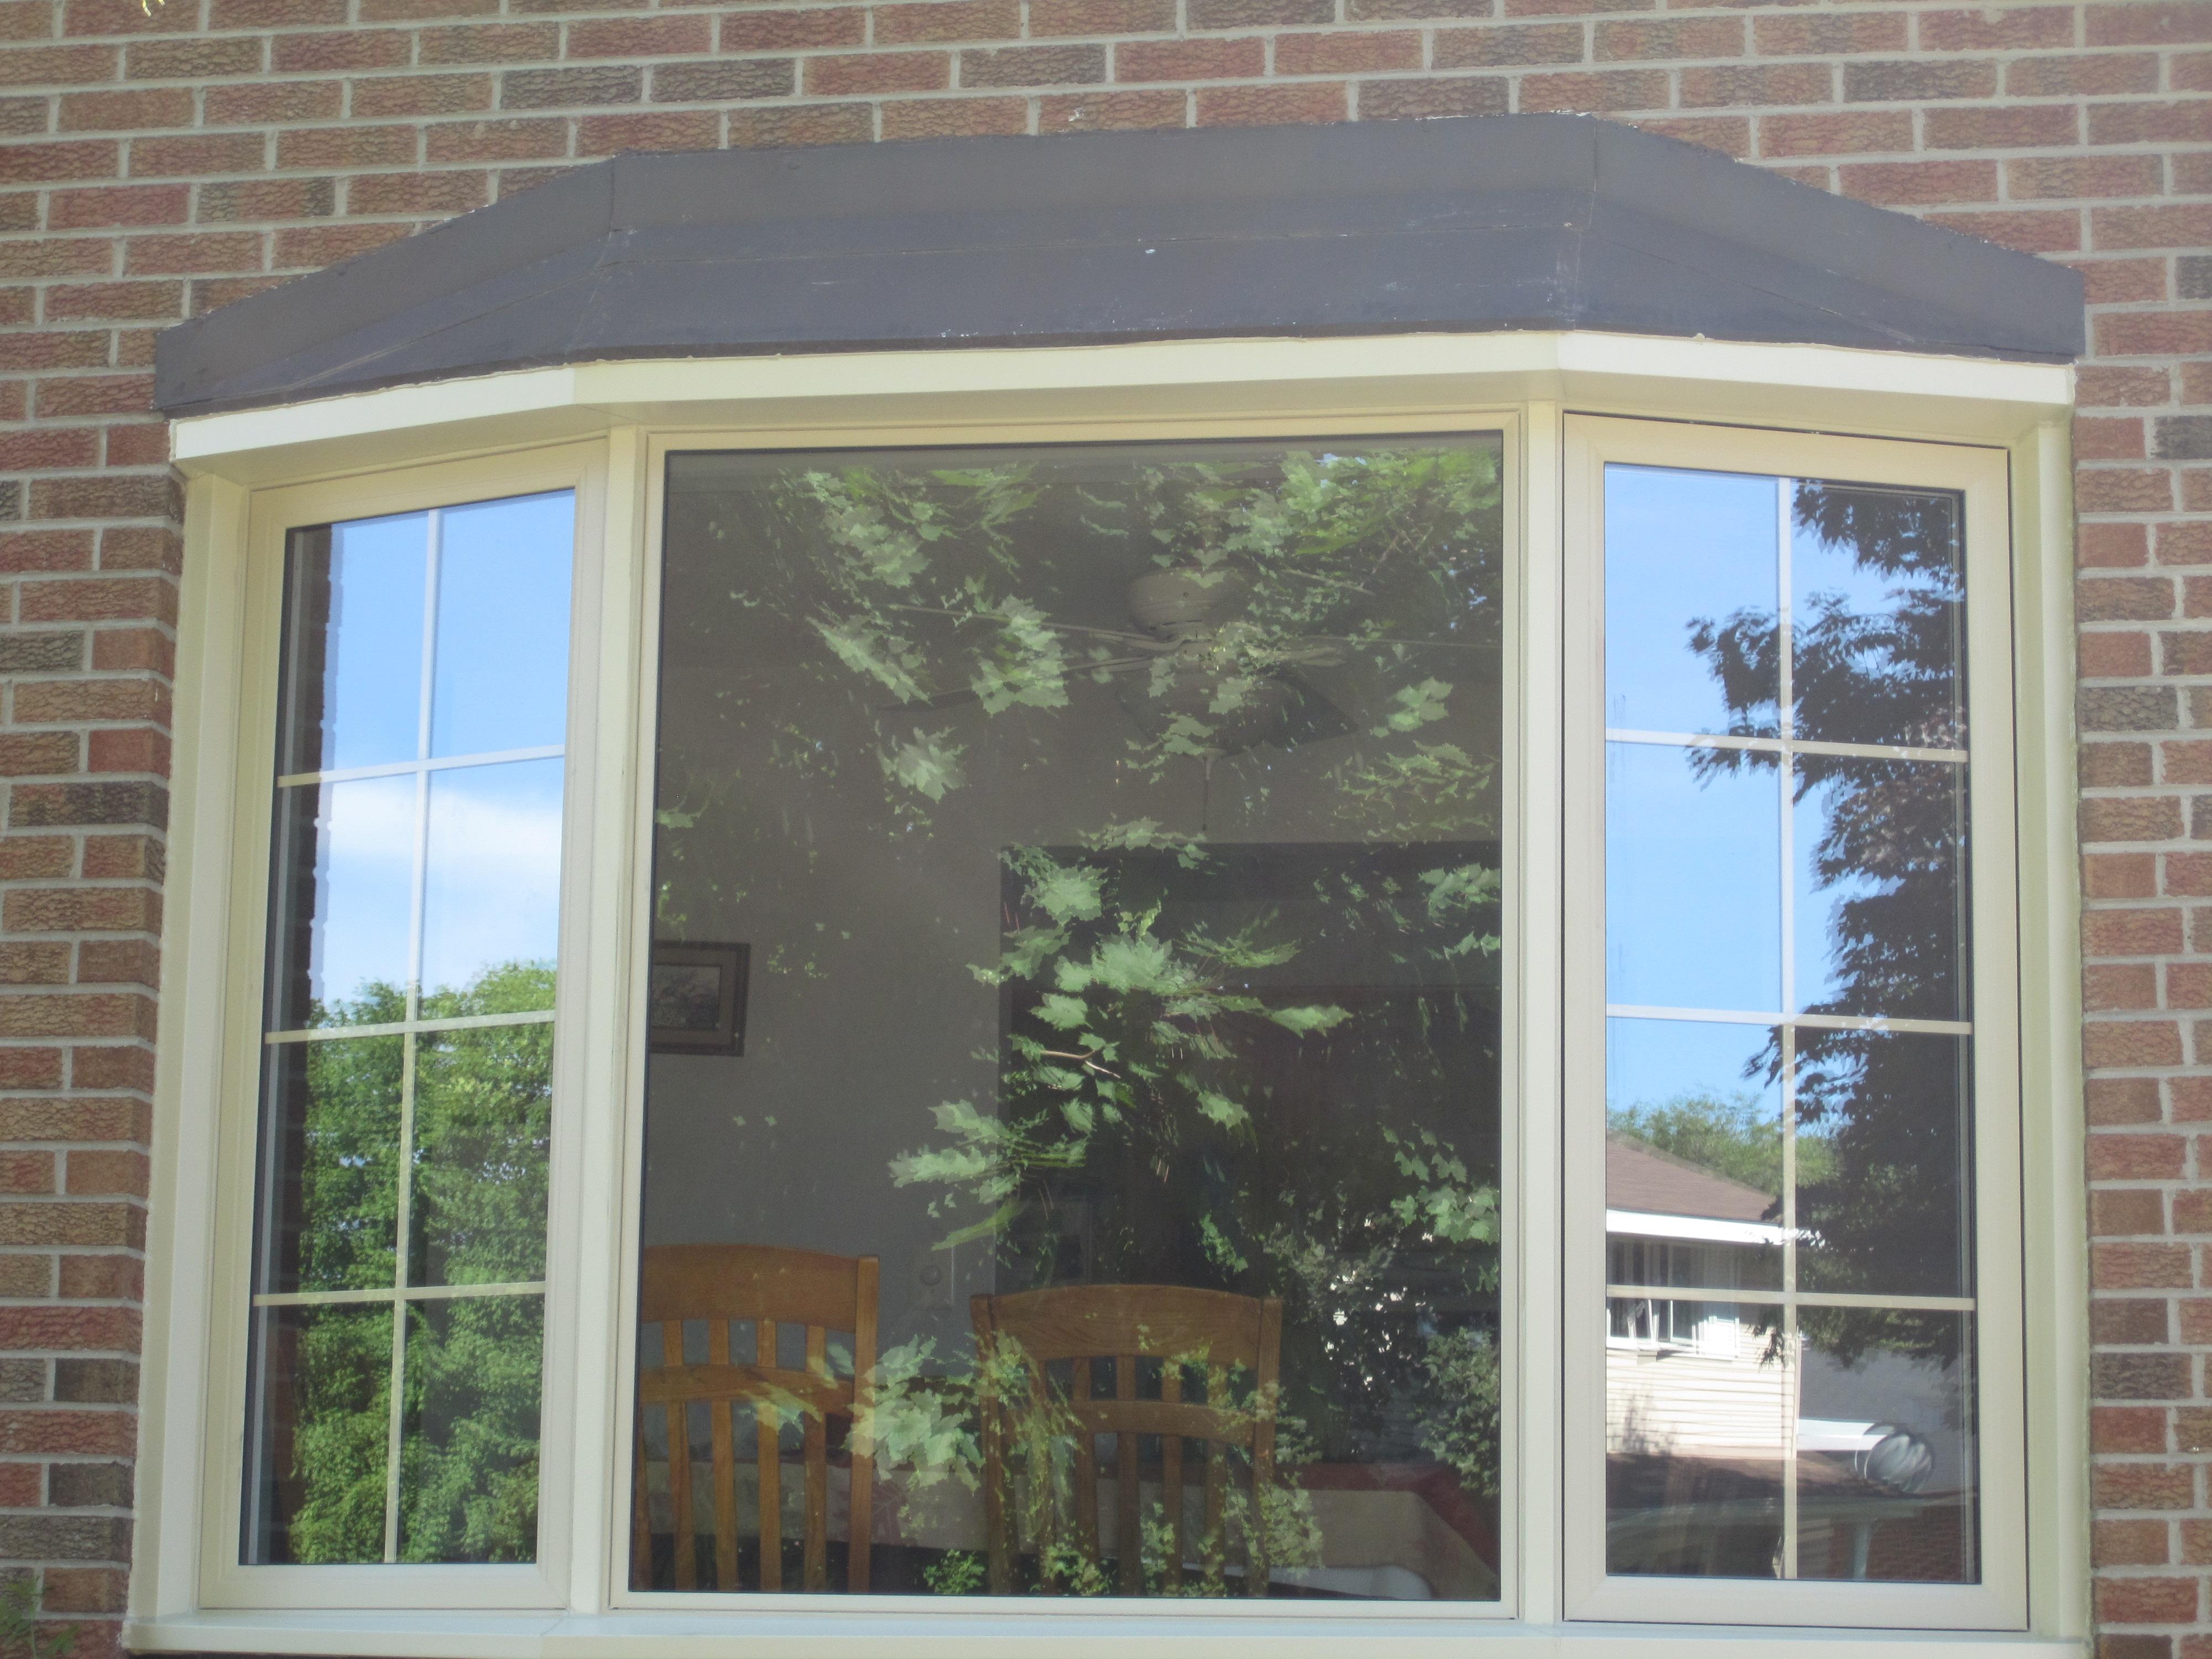 Loewen Window Centre & Loewen Window Centre | North Star Windows